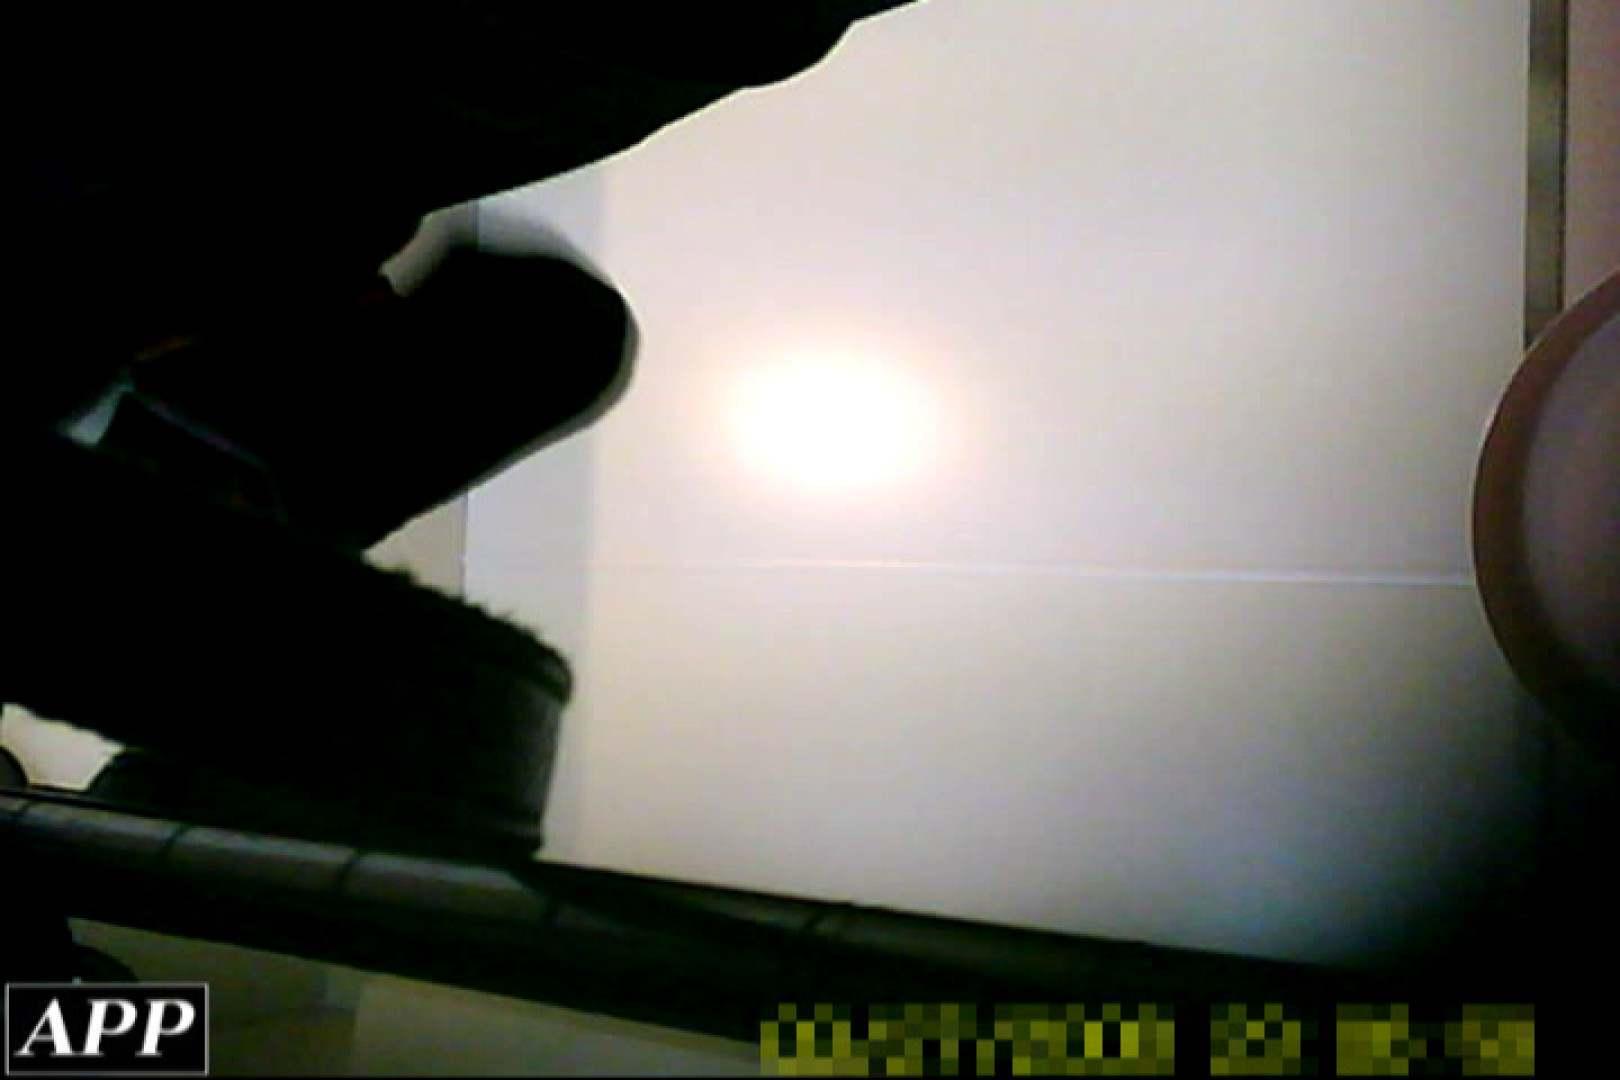 3視点洗面所 vol.004 OLエロ画像  107PICs 78